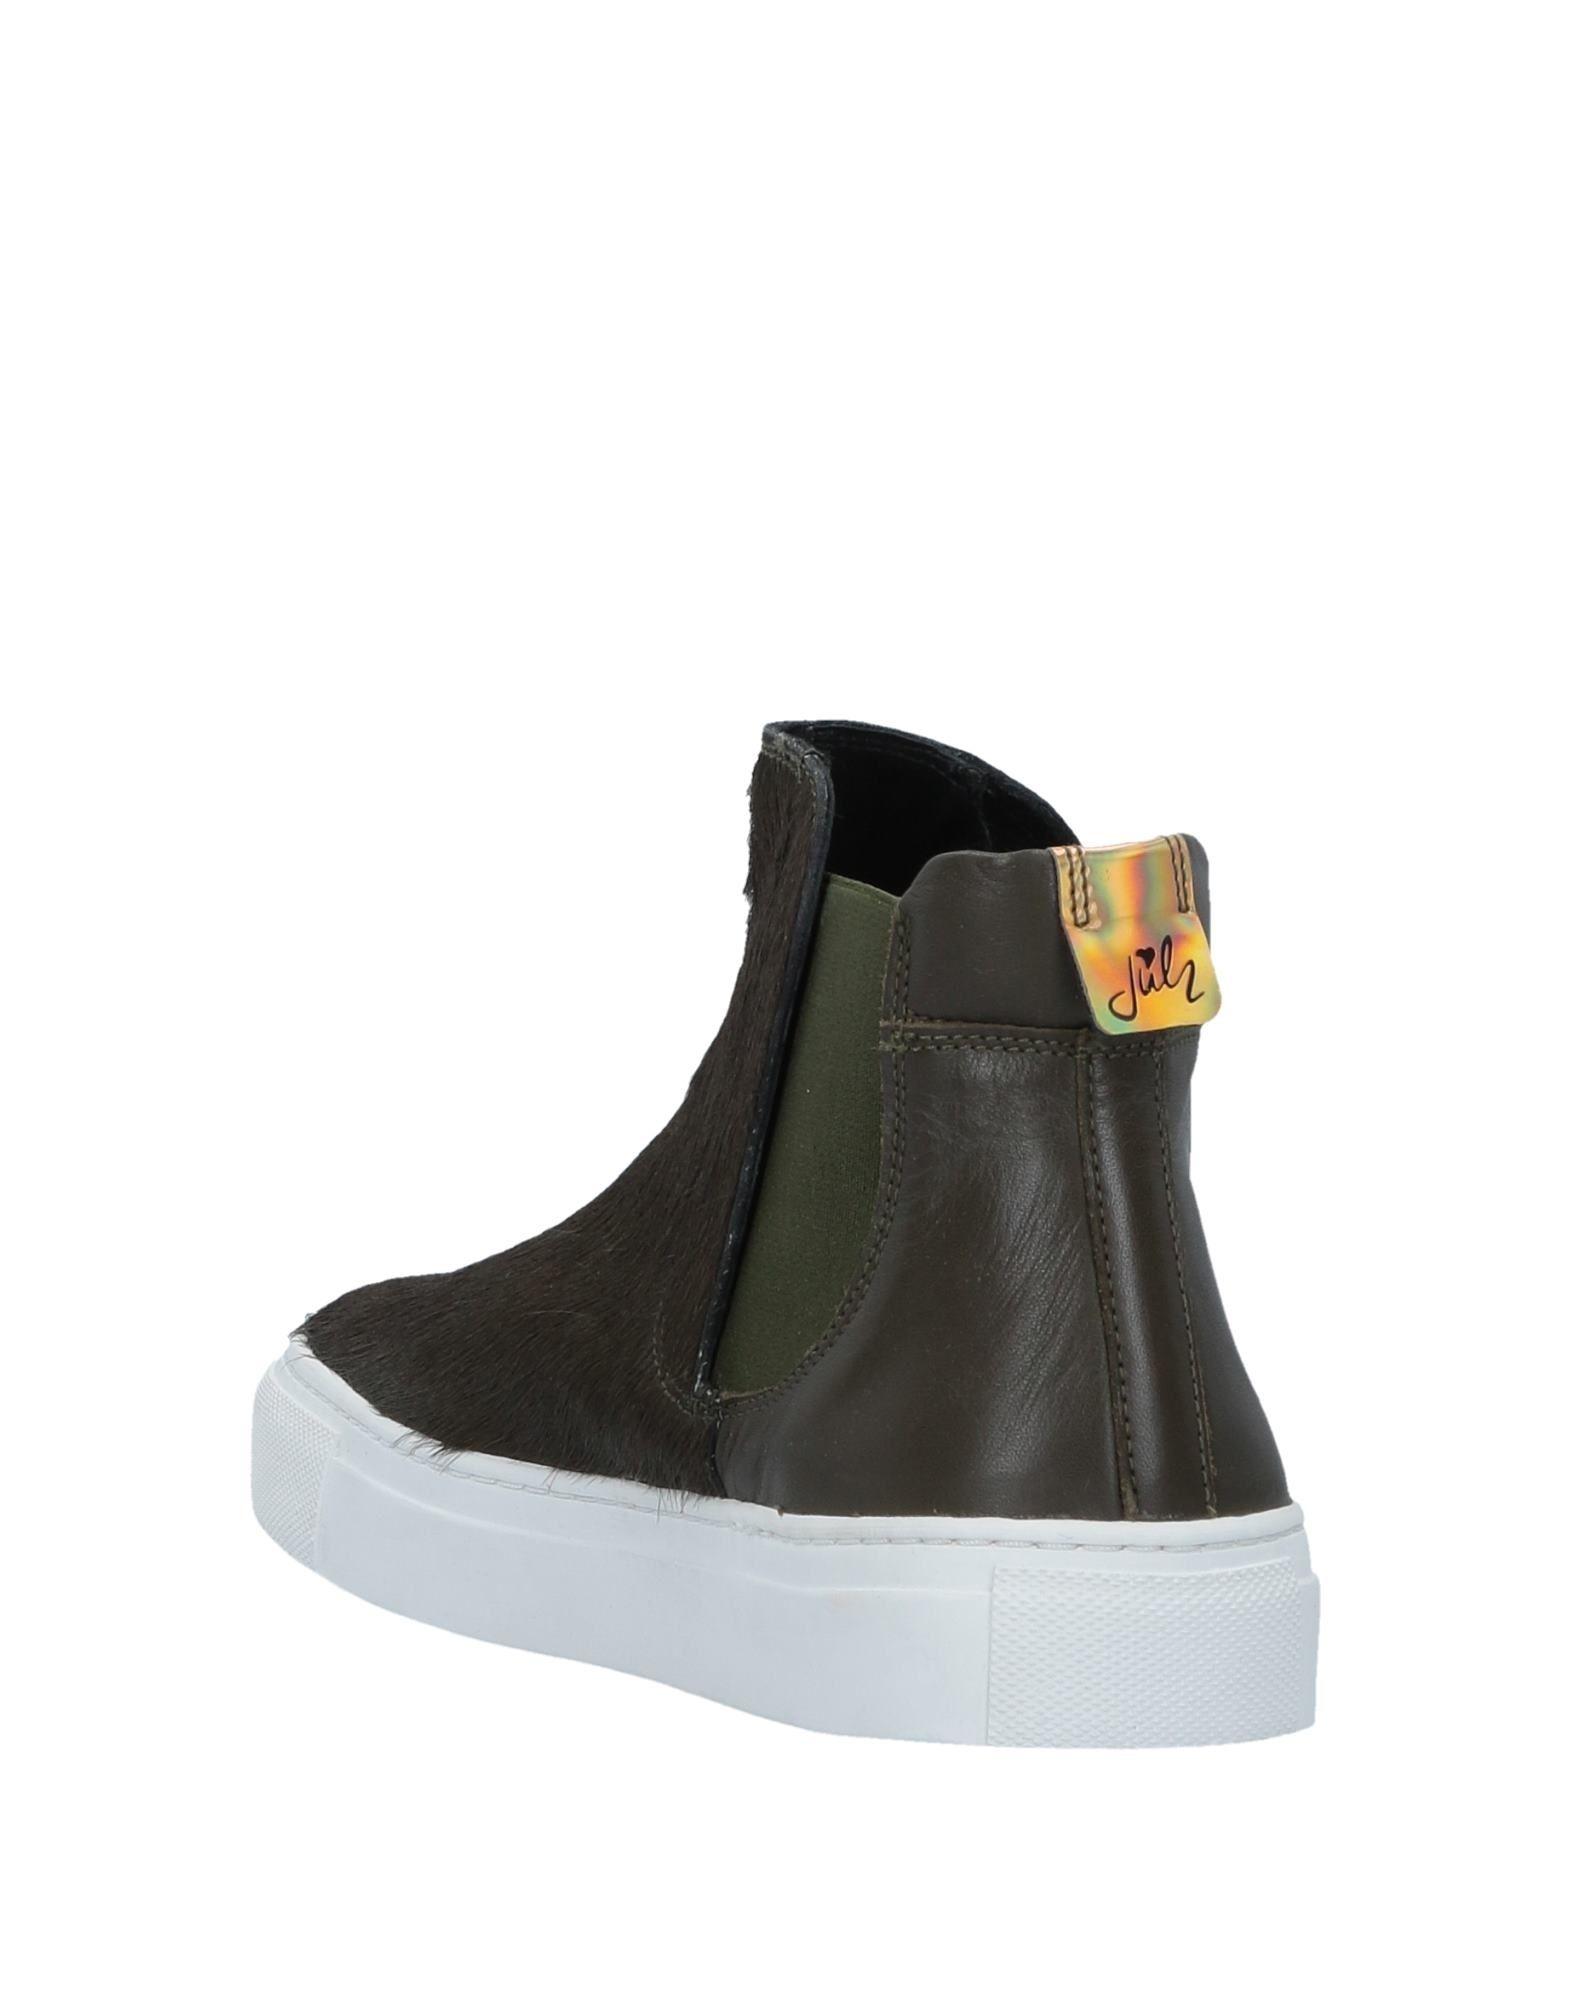 Julz  Fresh Groceries Sneakers Damen  Julz 11508349SW ebd13b